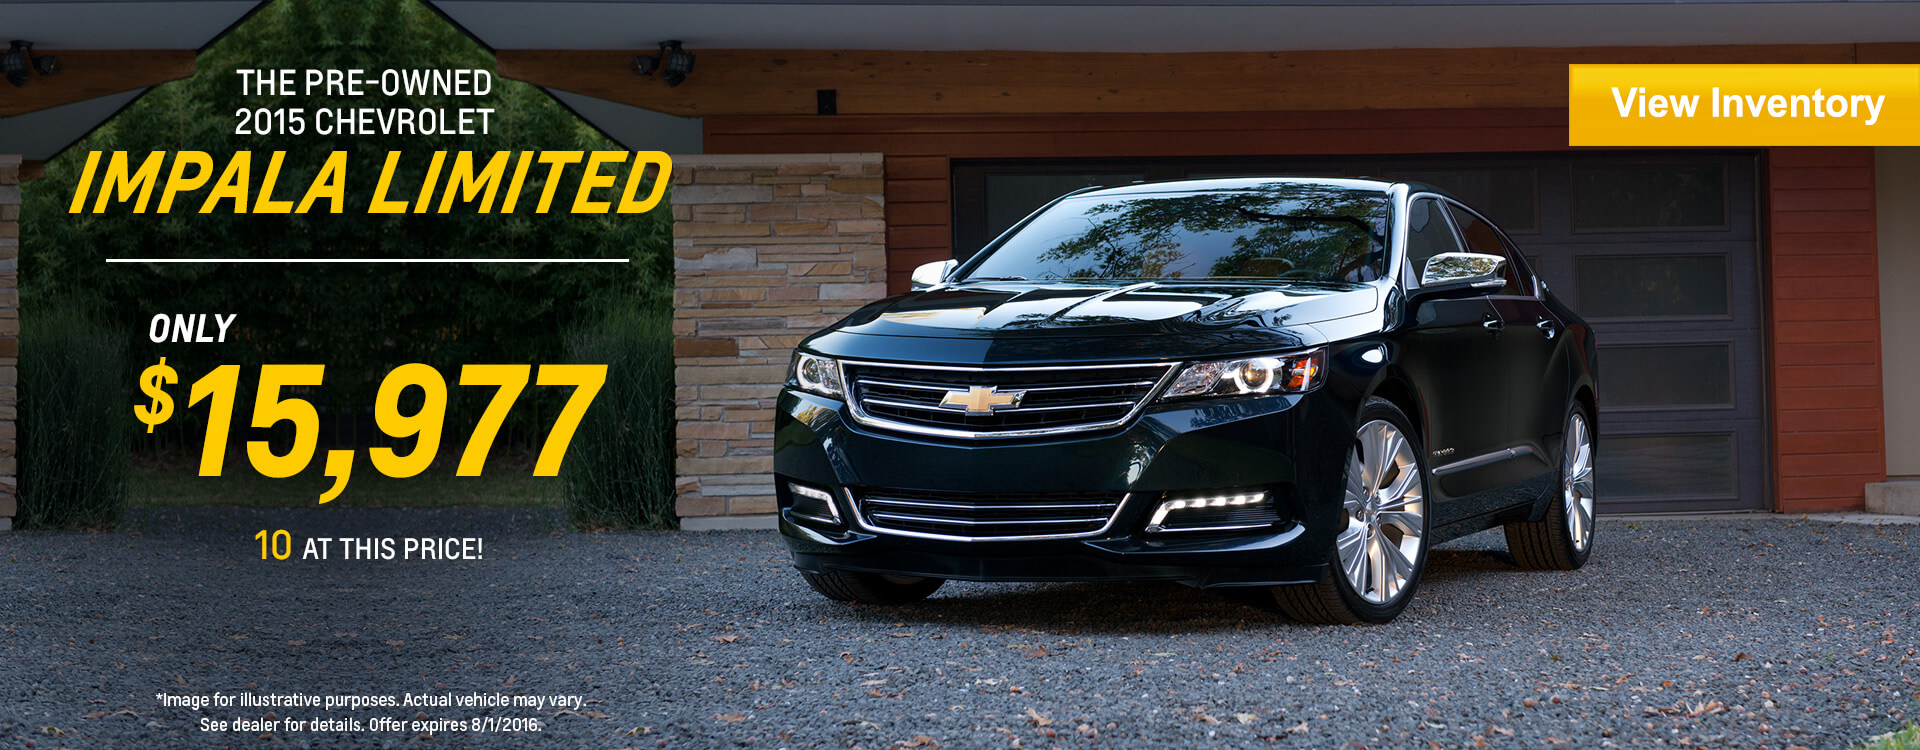 Pre Owned Impala